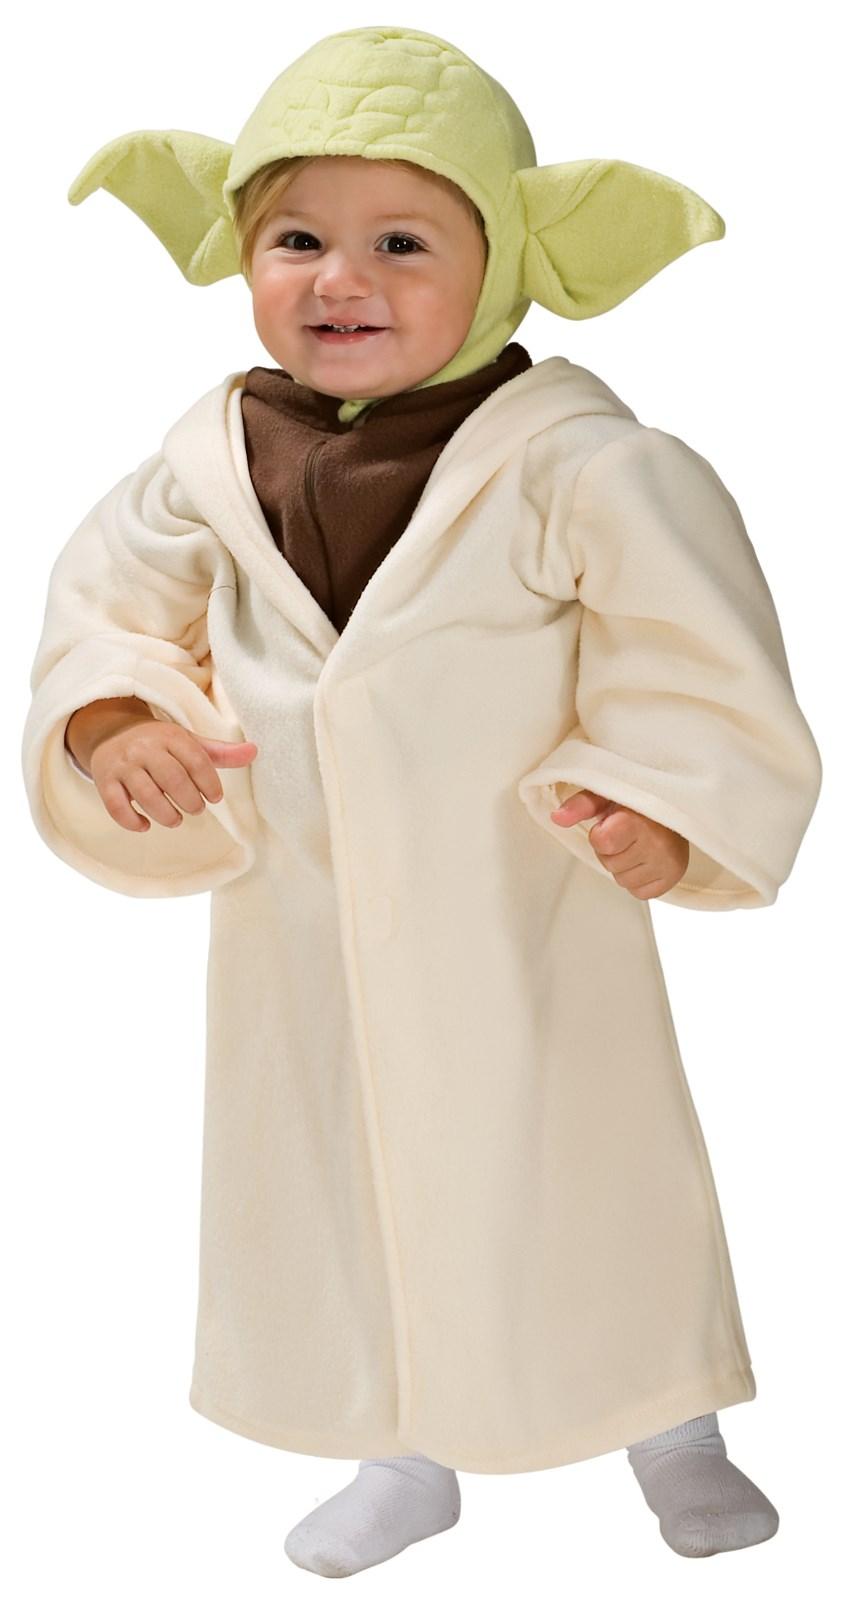 Star Wars: Toddler Yoda Costume